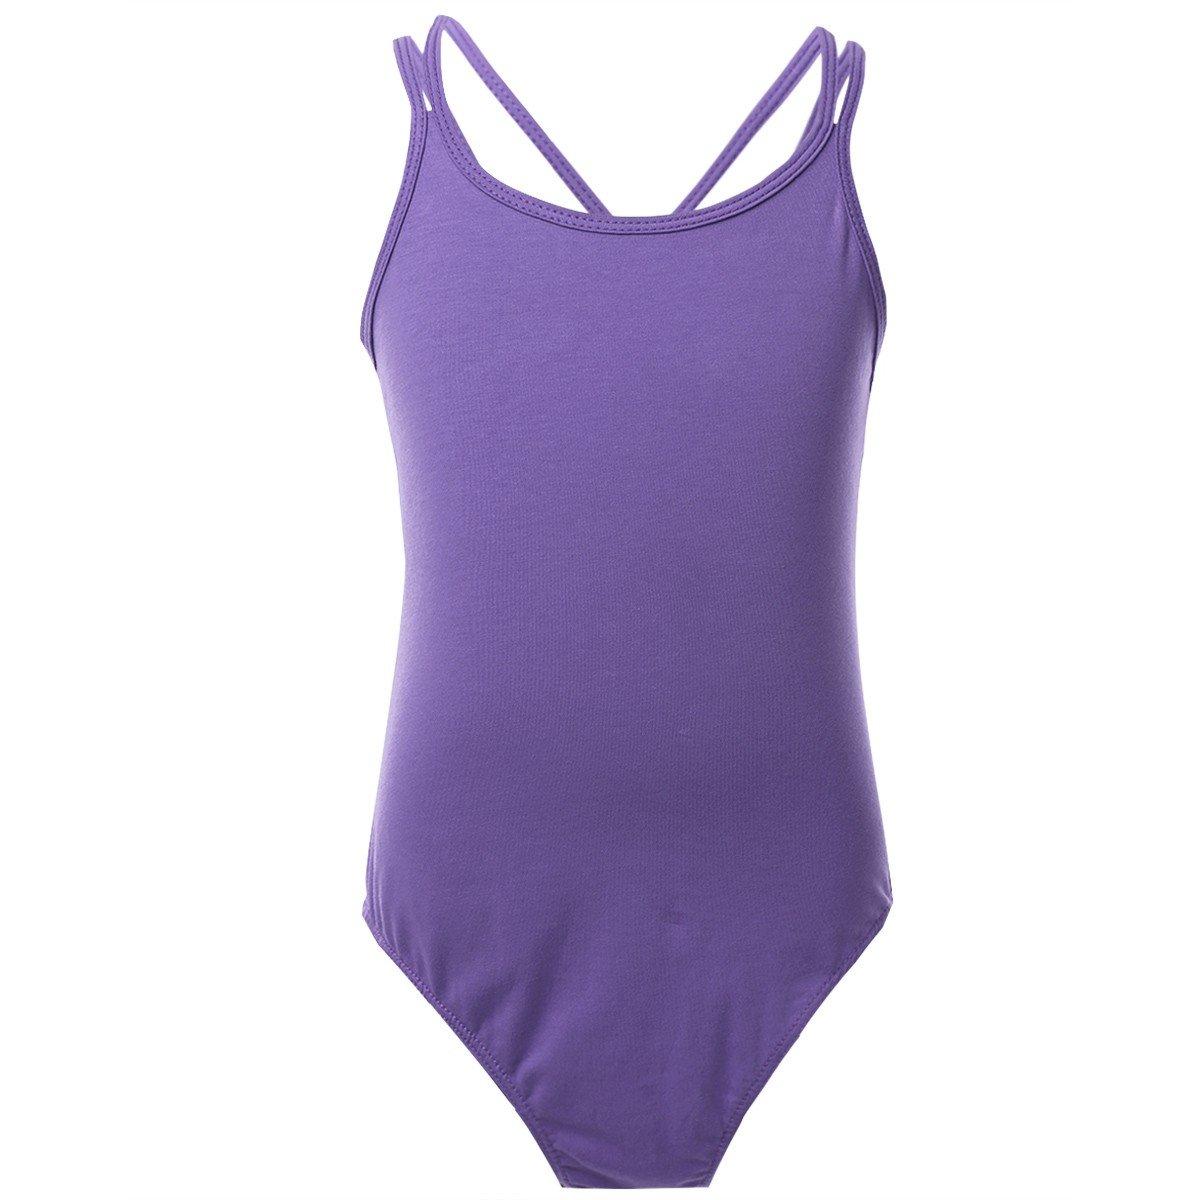 TiaoBug Kids Girls Spaghetti Strap Criss Cross Back Ballet Dance Dancewear Gymnastics Leotard Dress